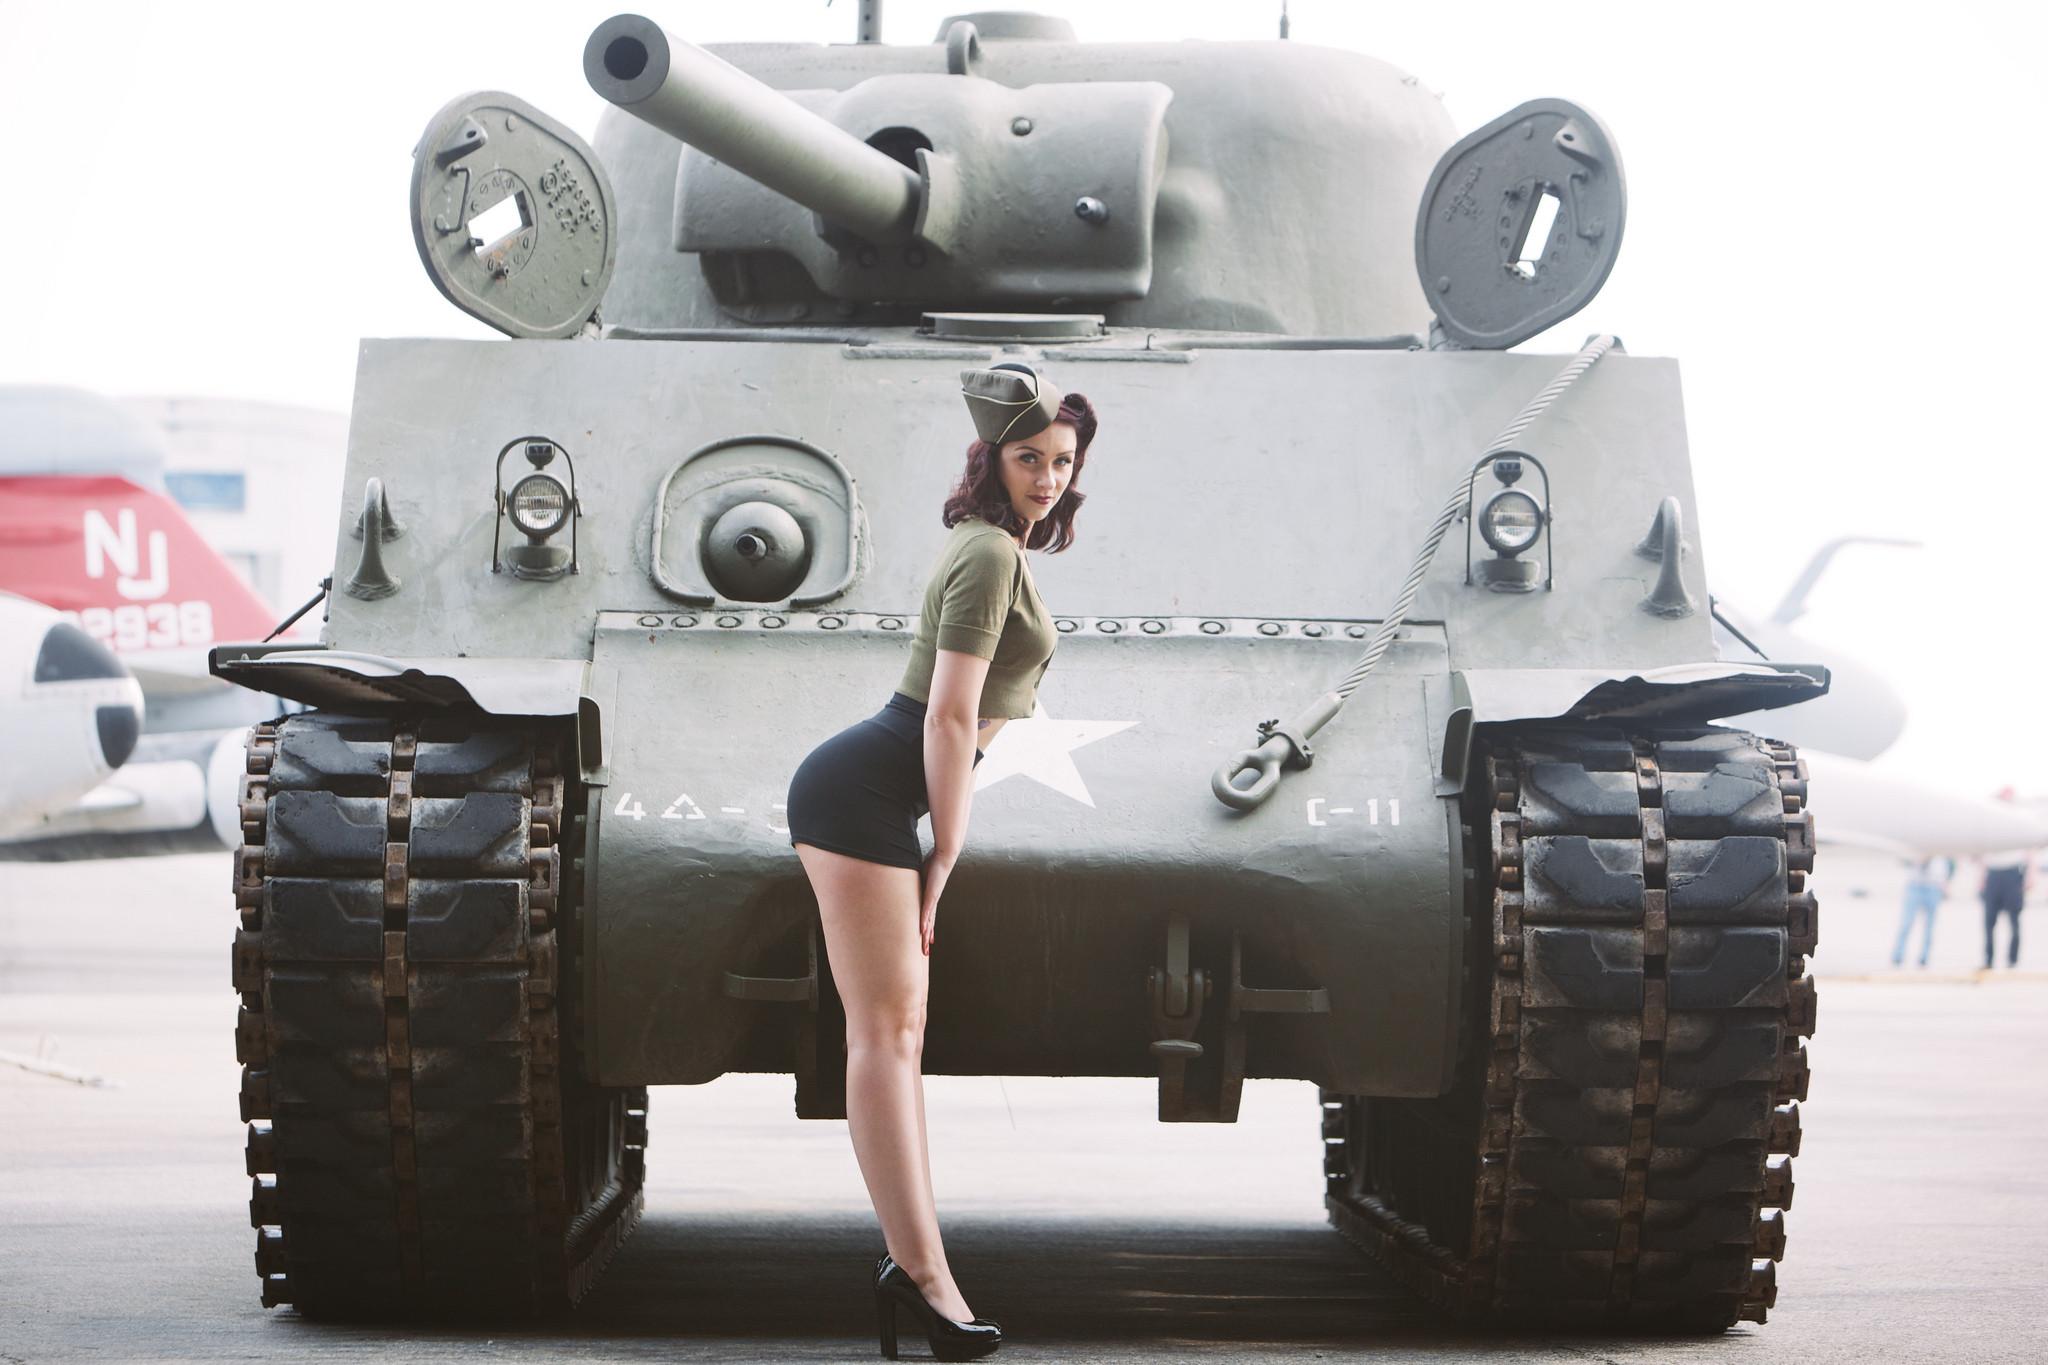 classy tank girl pin up wallpaper by vDelta RevelWallpapersnet 2048x1365